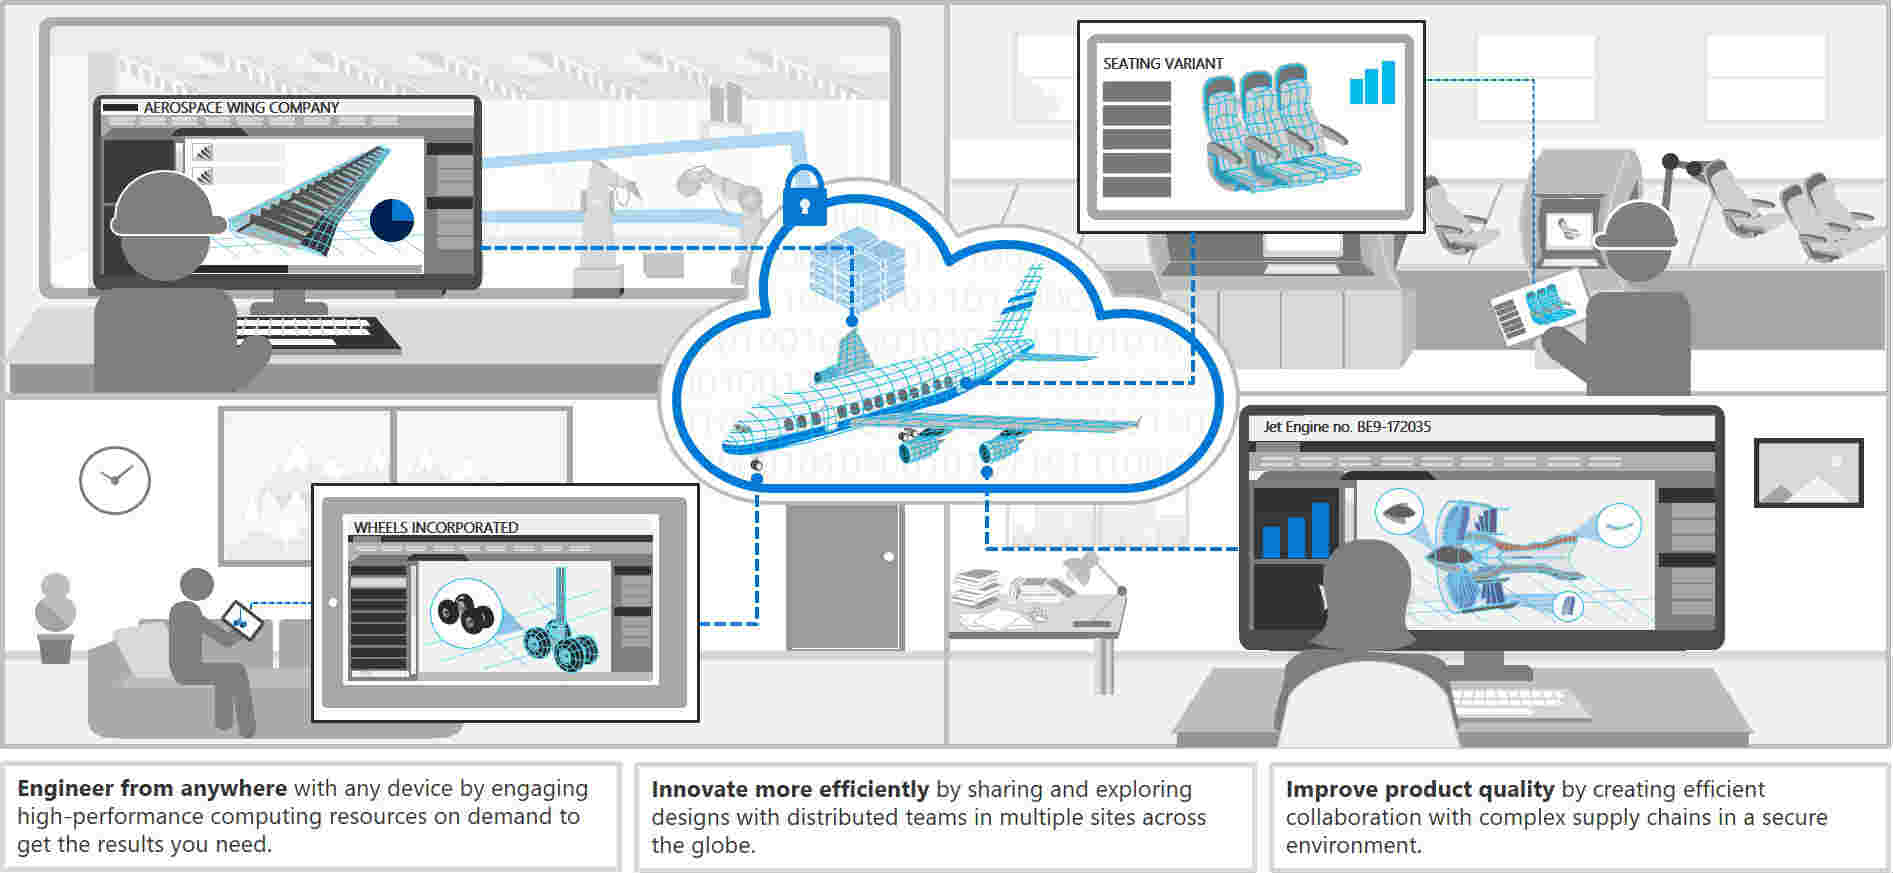 Airplane manufacturing process illustration